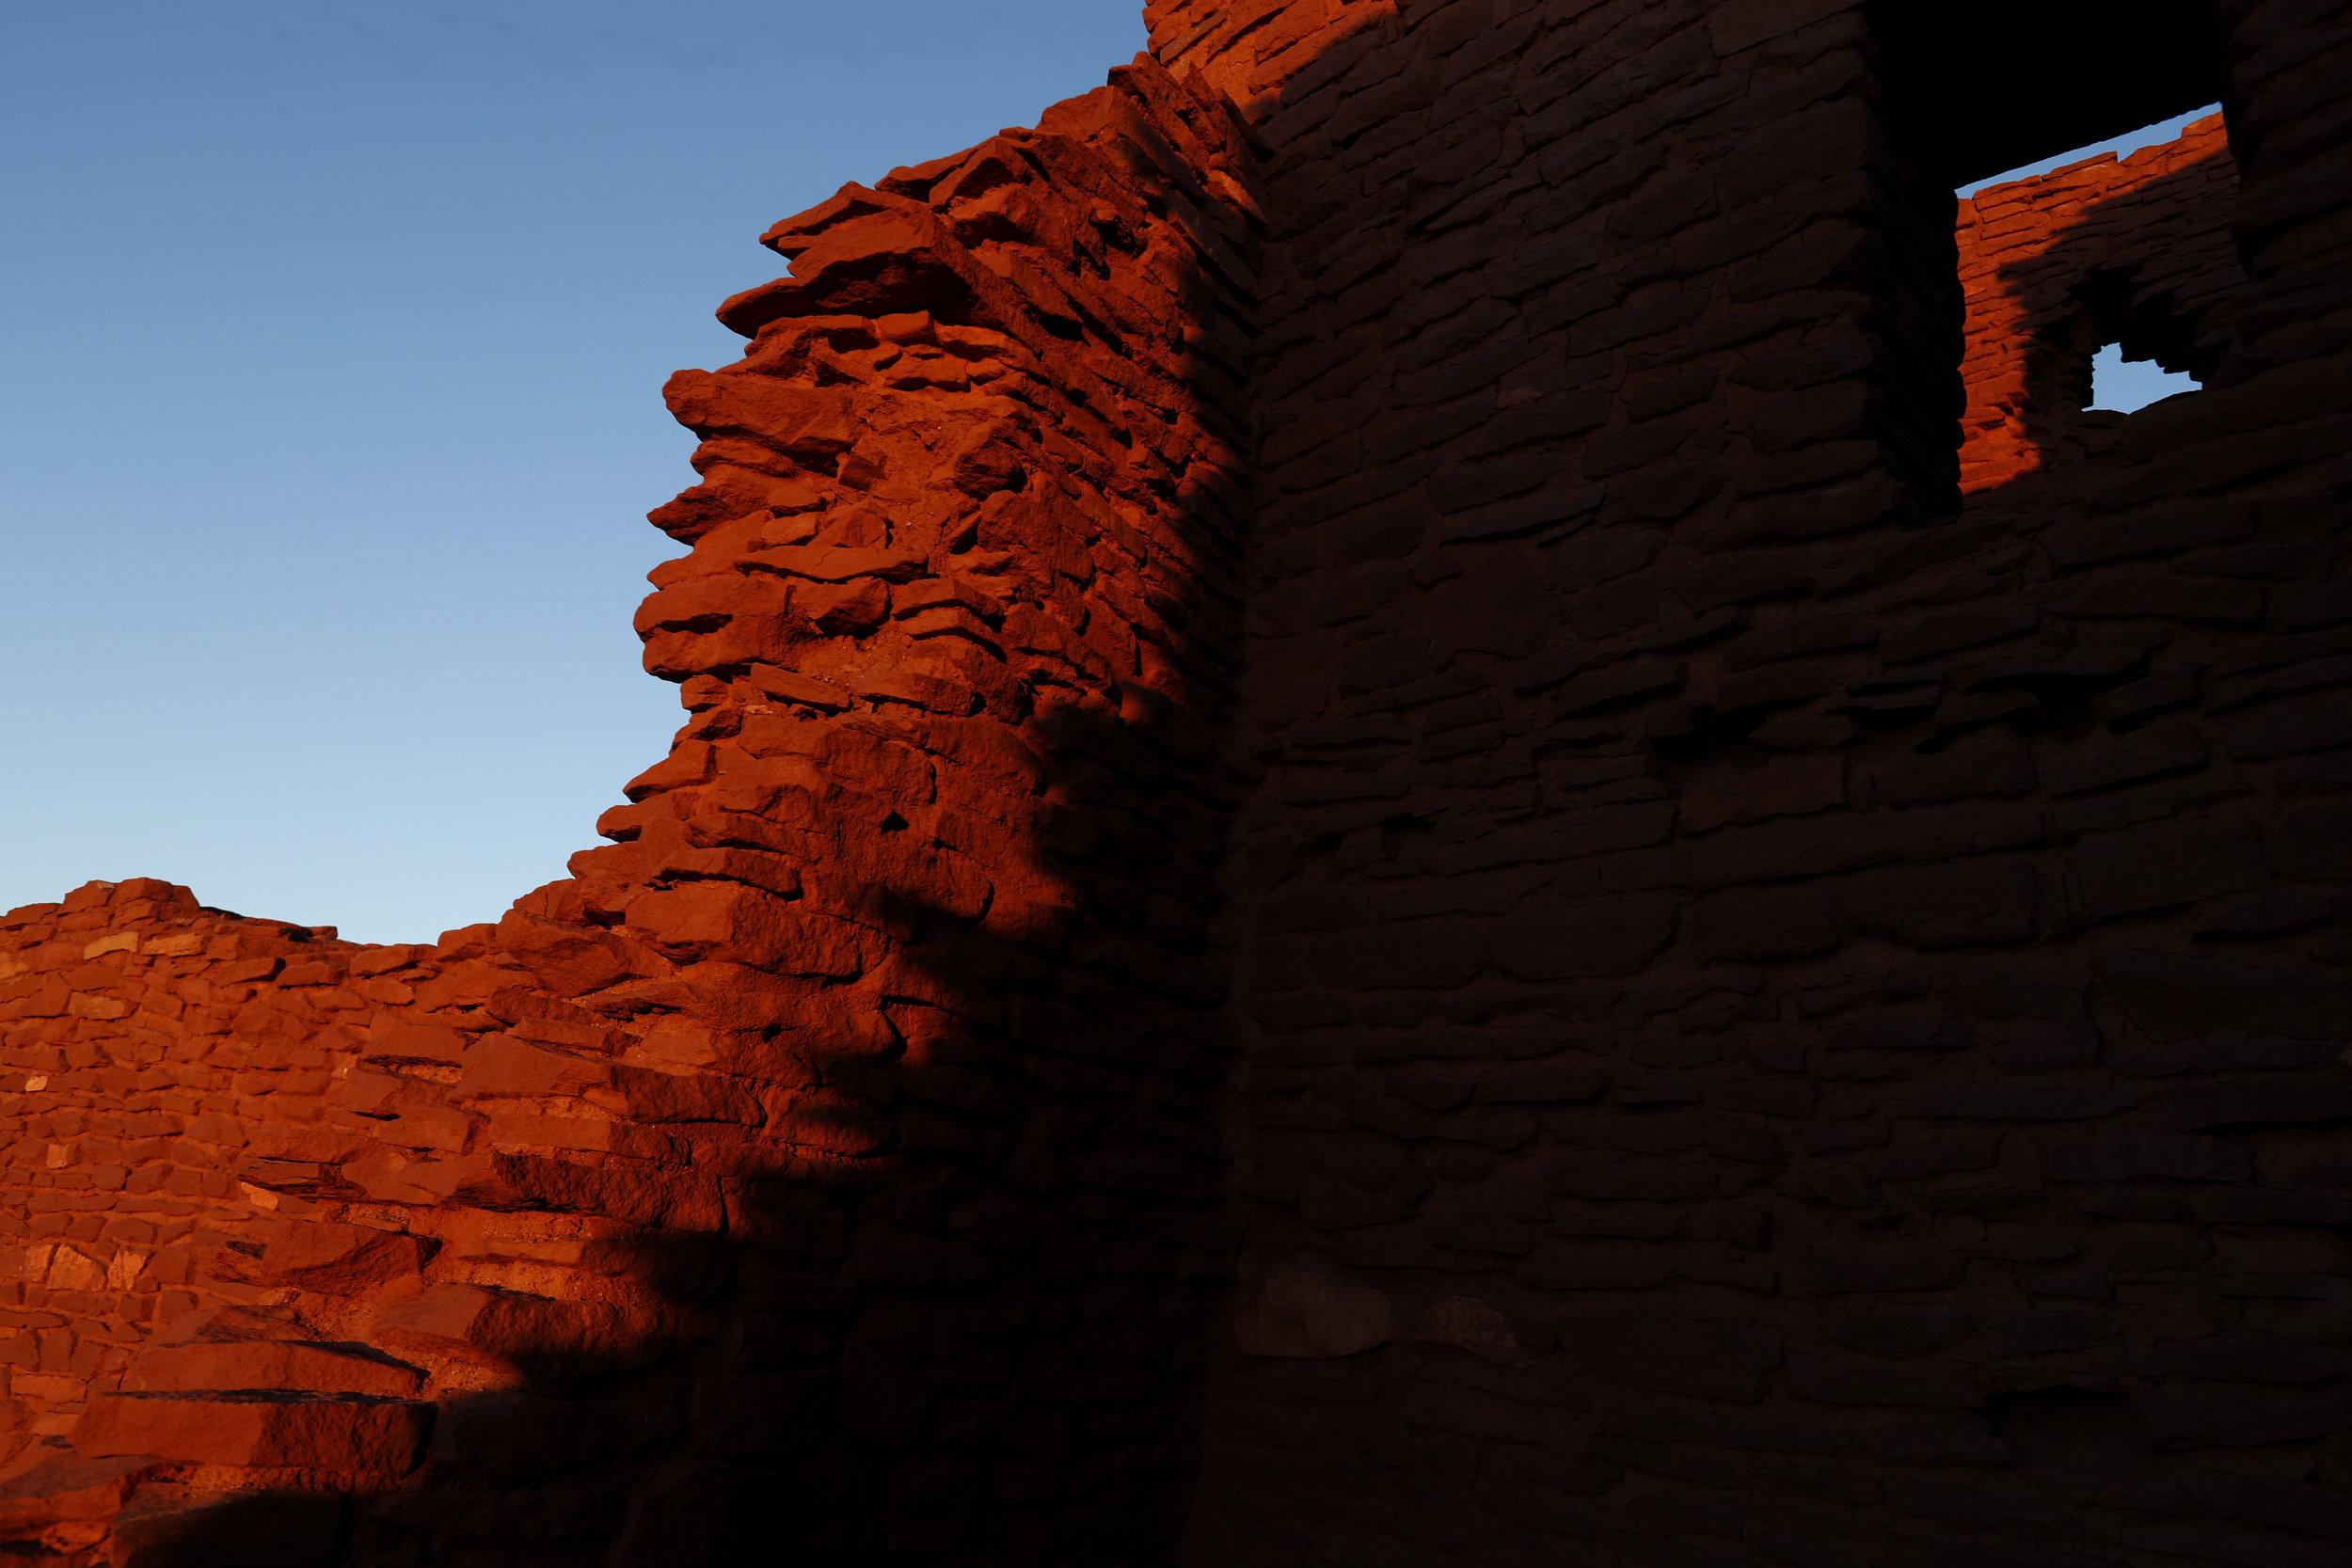 The sun rises on the Wukoki Pueblo, Thursday, Oct. 6, 2016, near Flagstaff, Ariz.The Wukoki were in the area between the years of 1120 through 1210. (Kevin Martin)